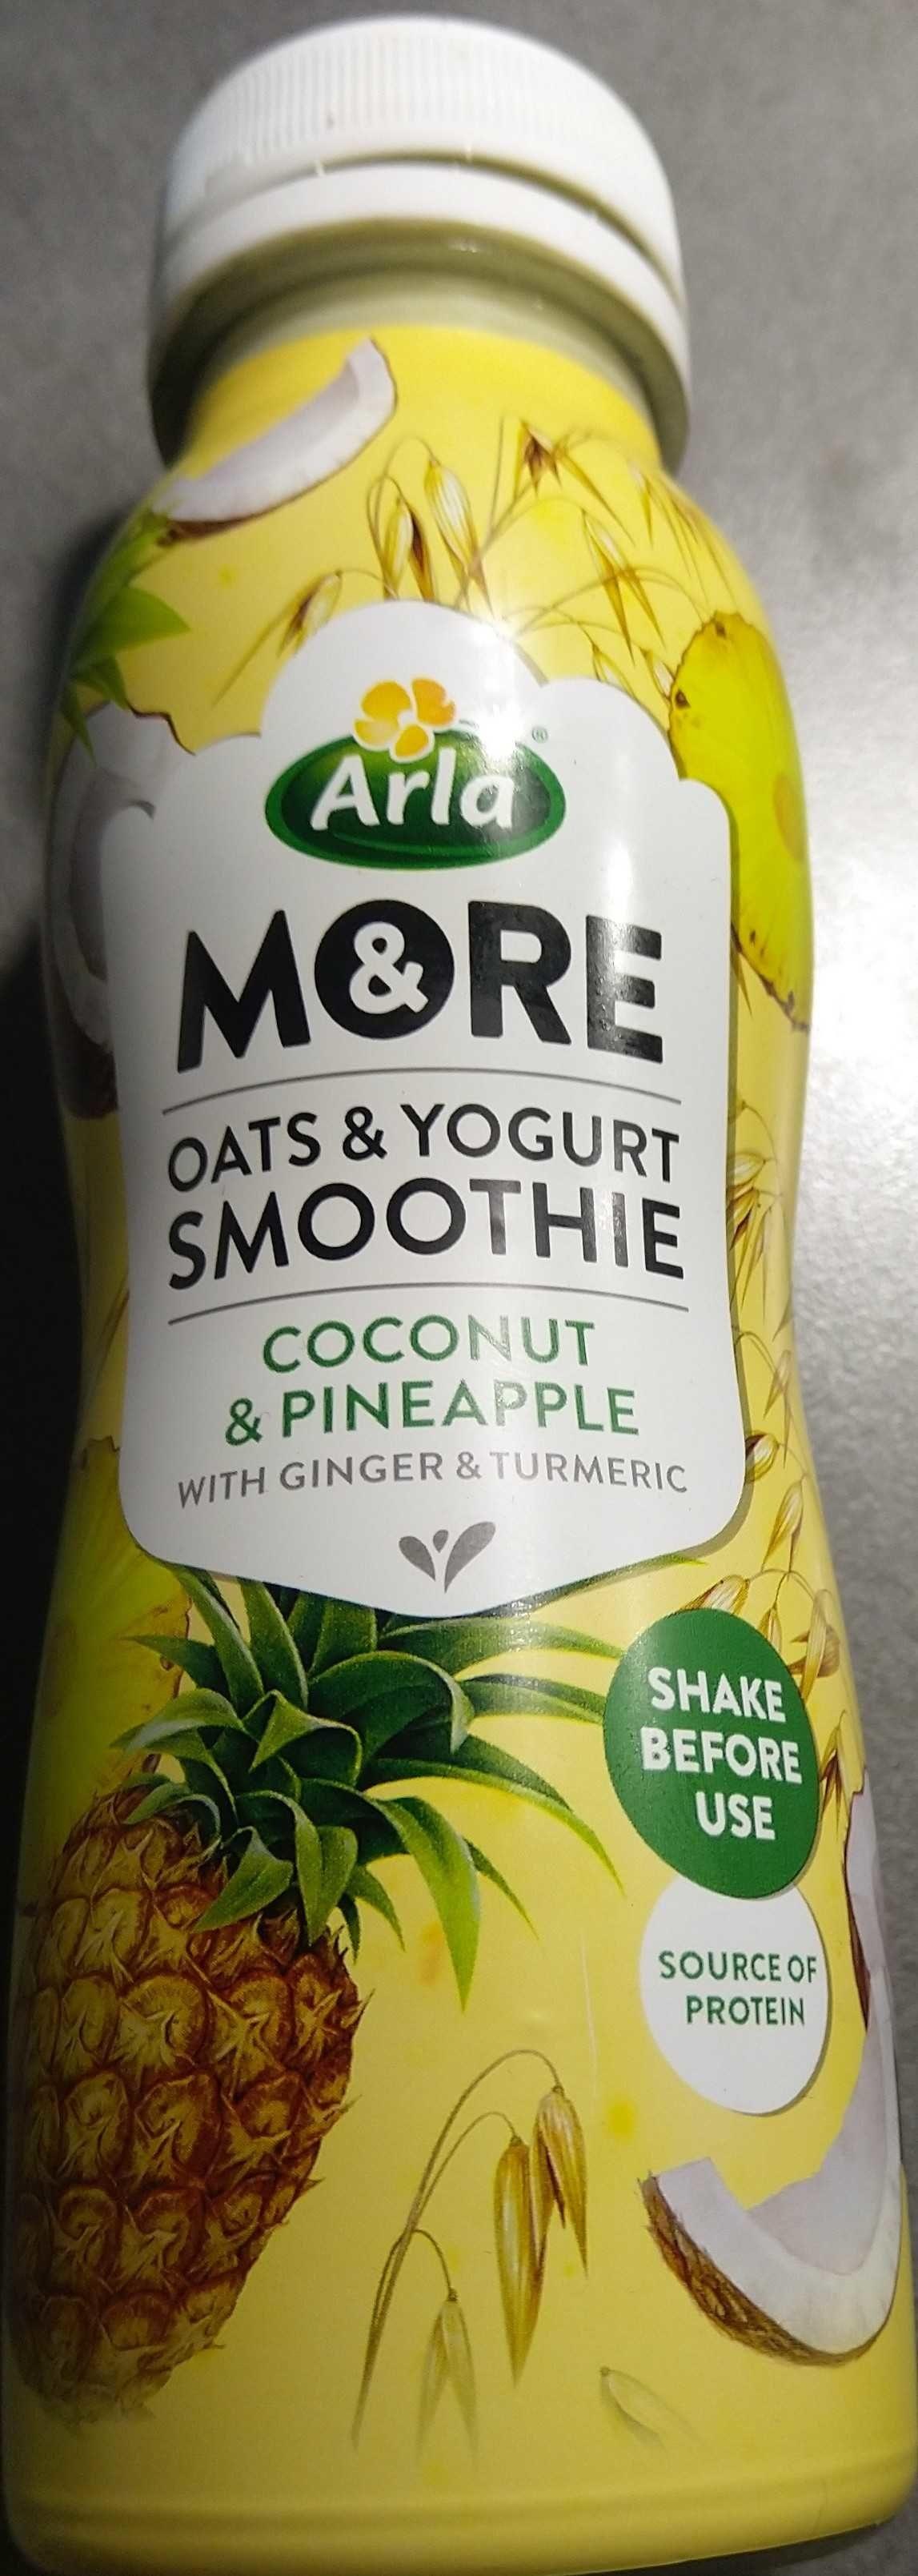 More - Oats & Yogurt Smoothie, Coconut & Pineapple - Product - en